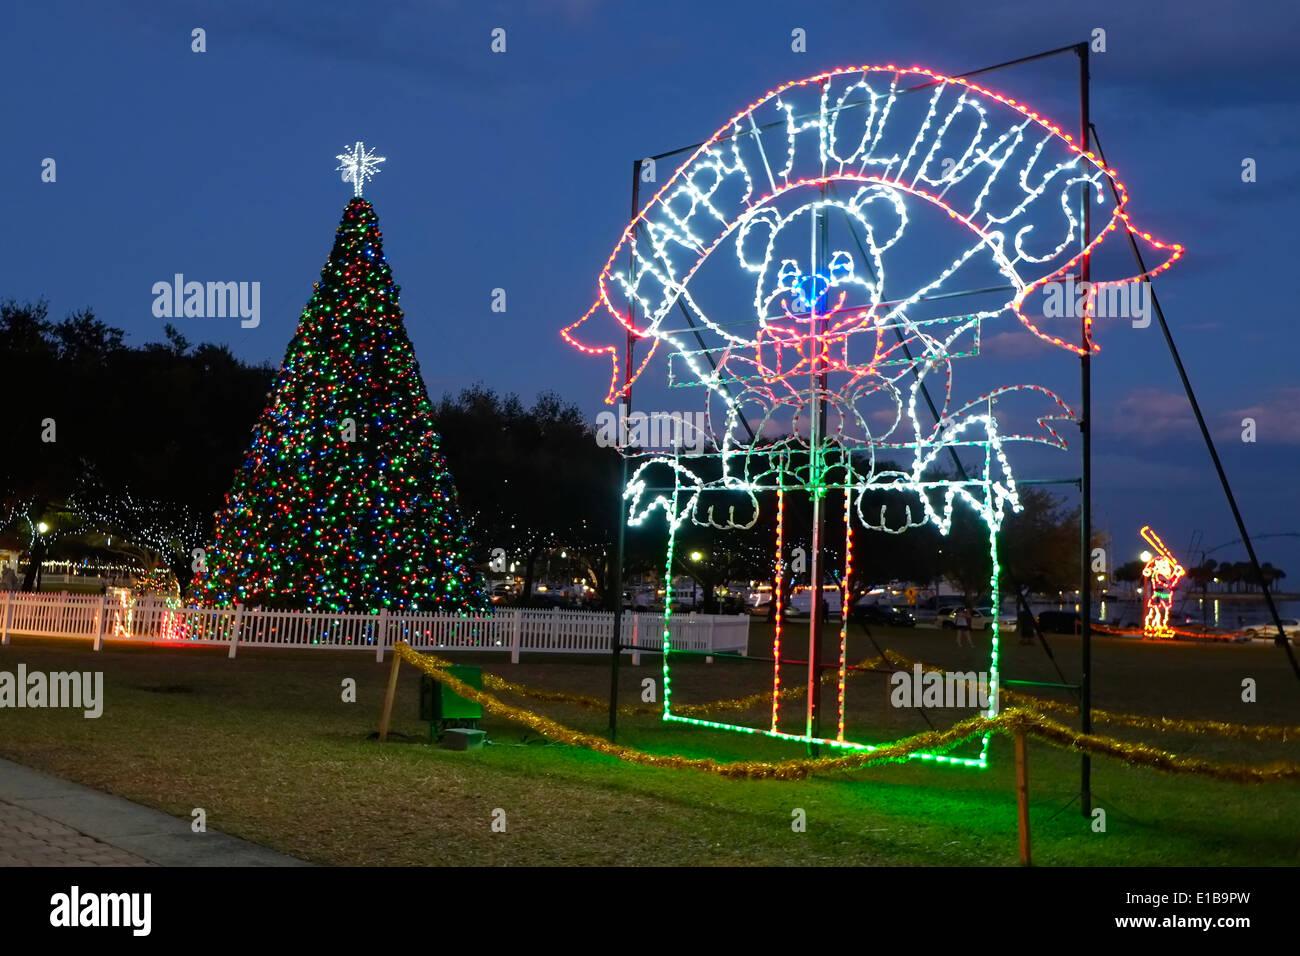 Florida christmas ornament - Christmas Ornament Display At North Straub Park St Petersburg Florida Fl